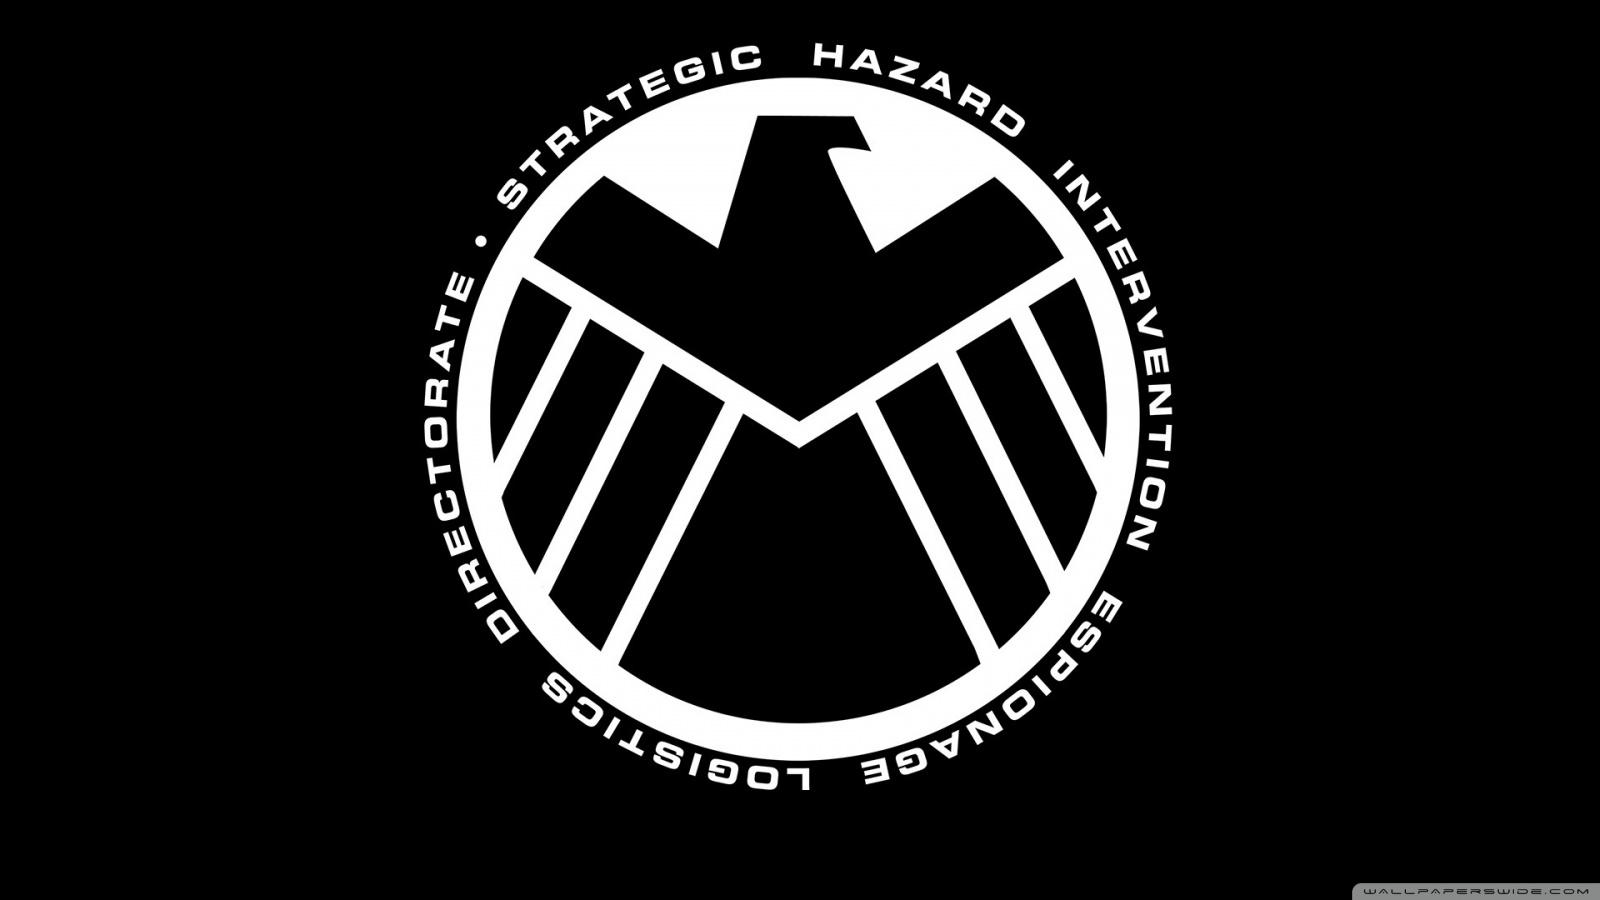 S.H.I.E.L.D. (Earth-616)